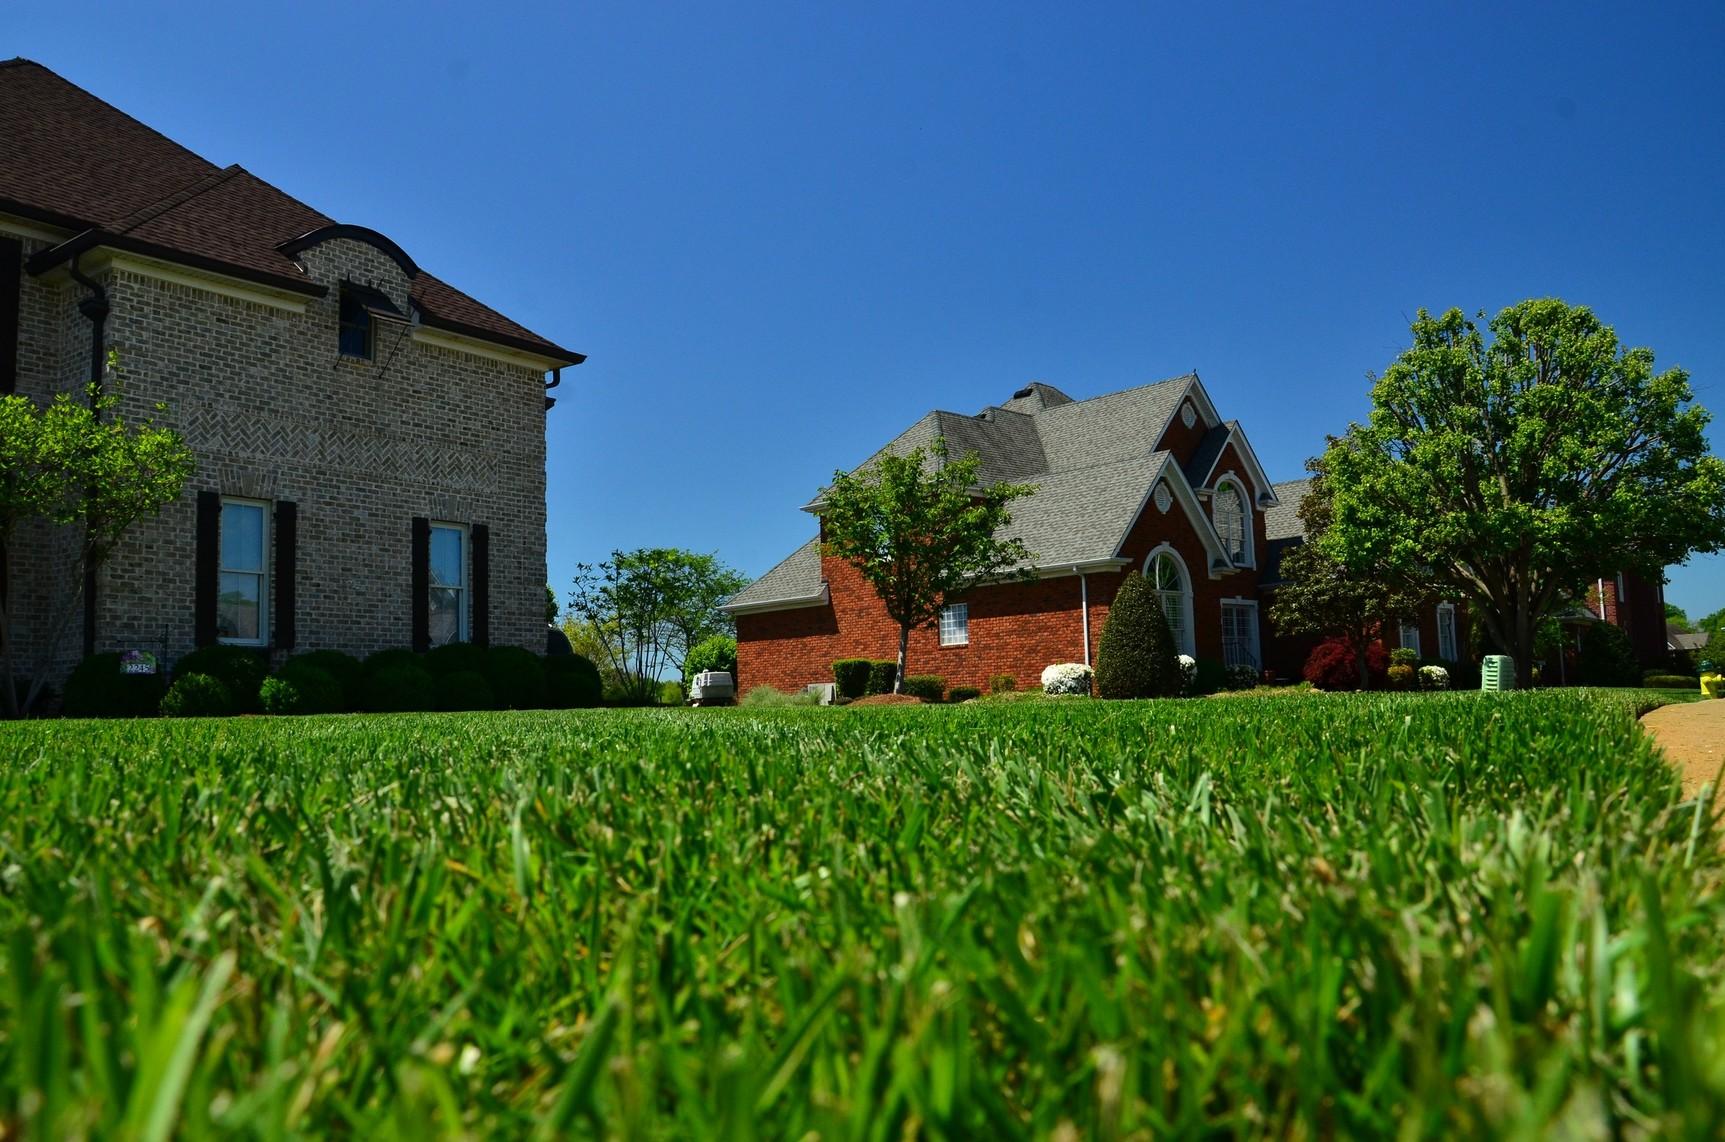 GreenPal Lawn Care App in Atlanta